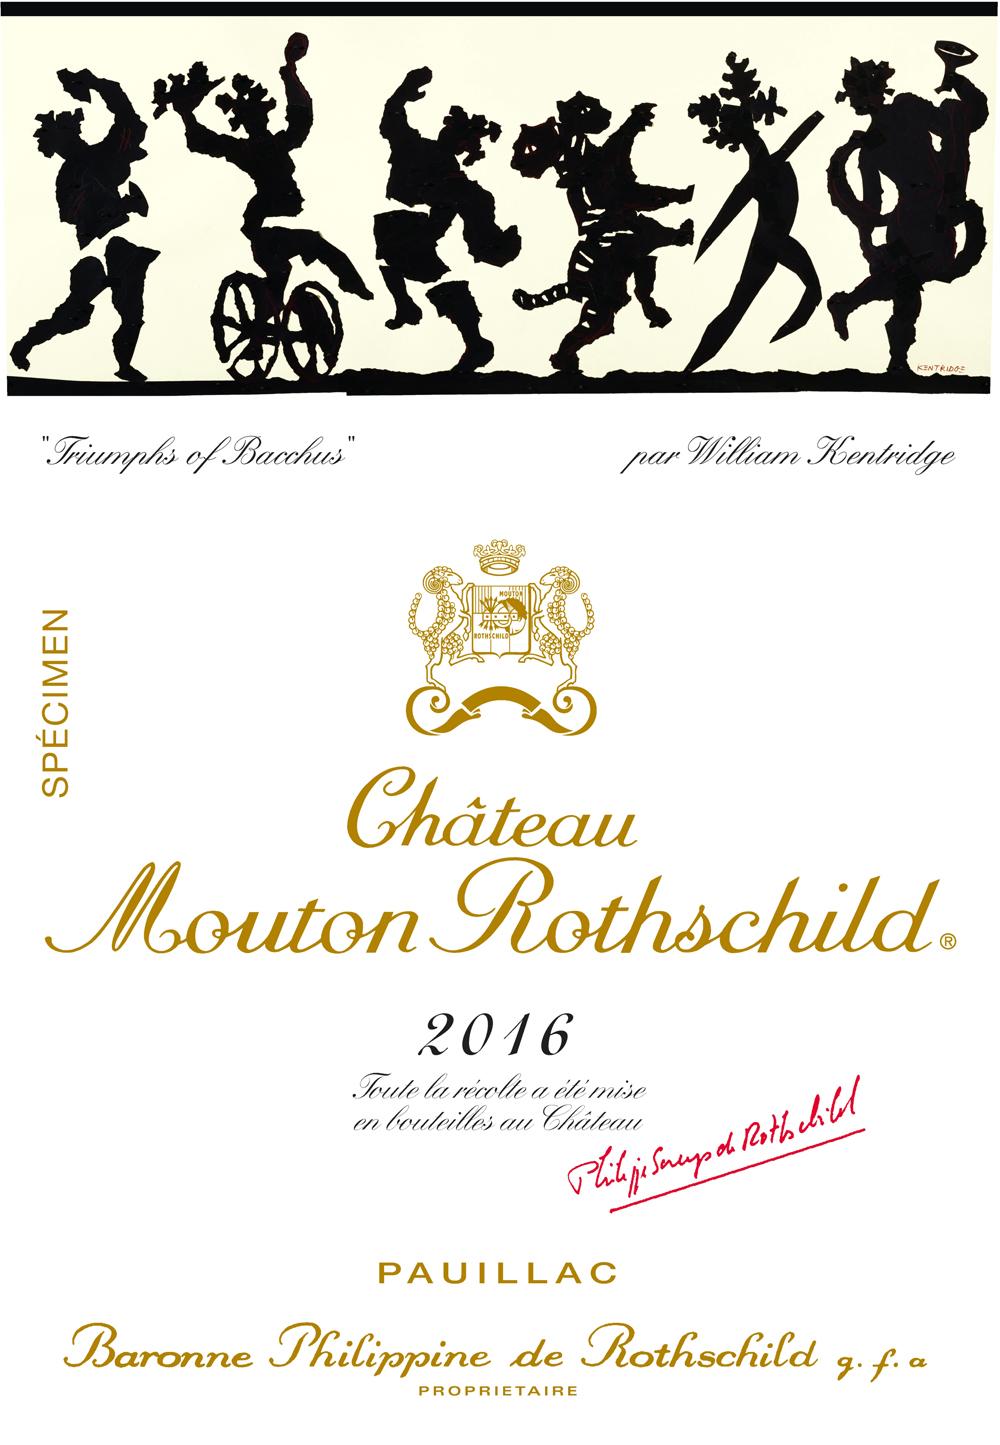 Mouton Rothschild 2016